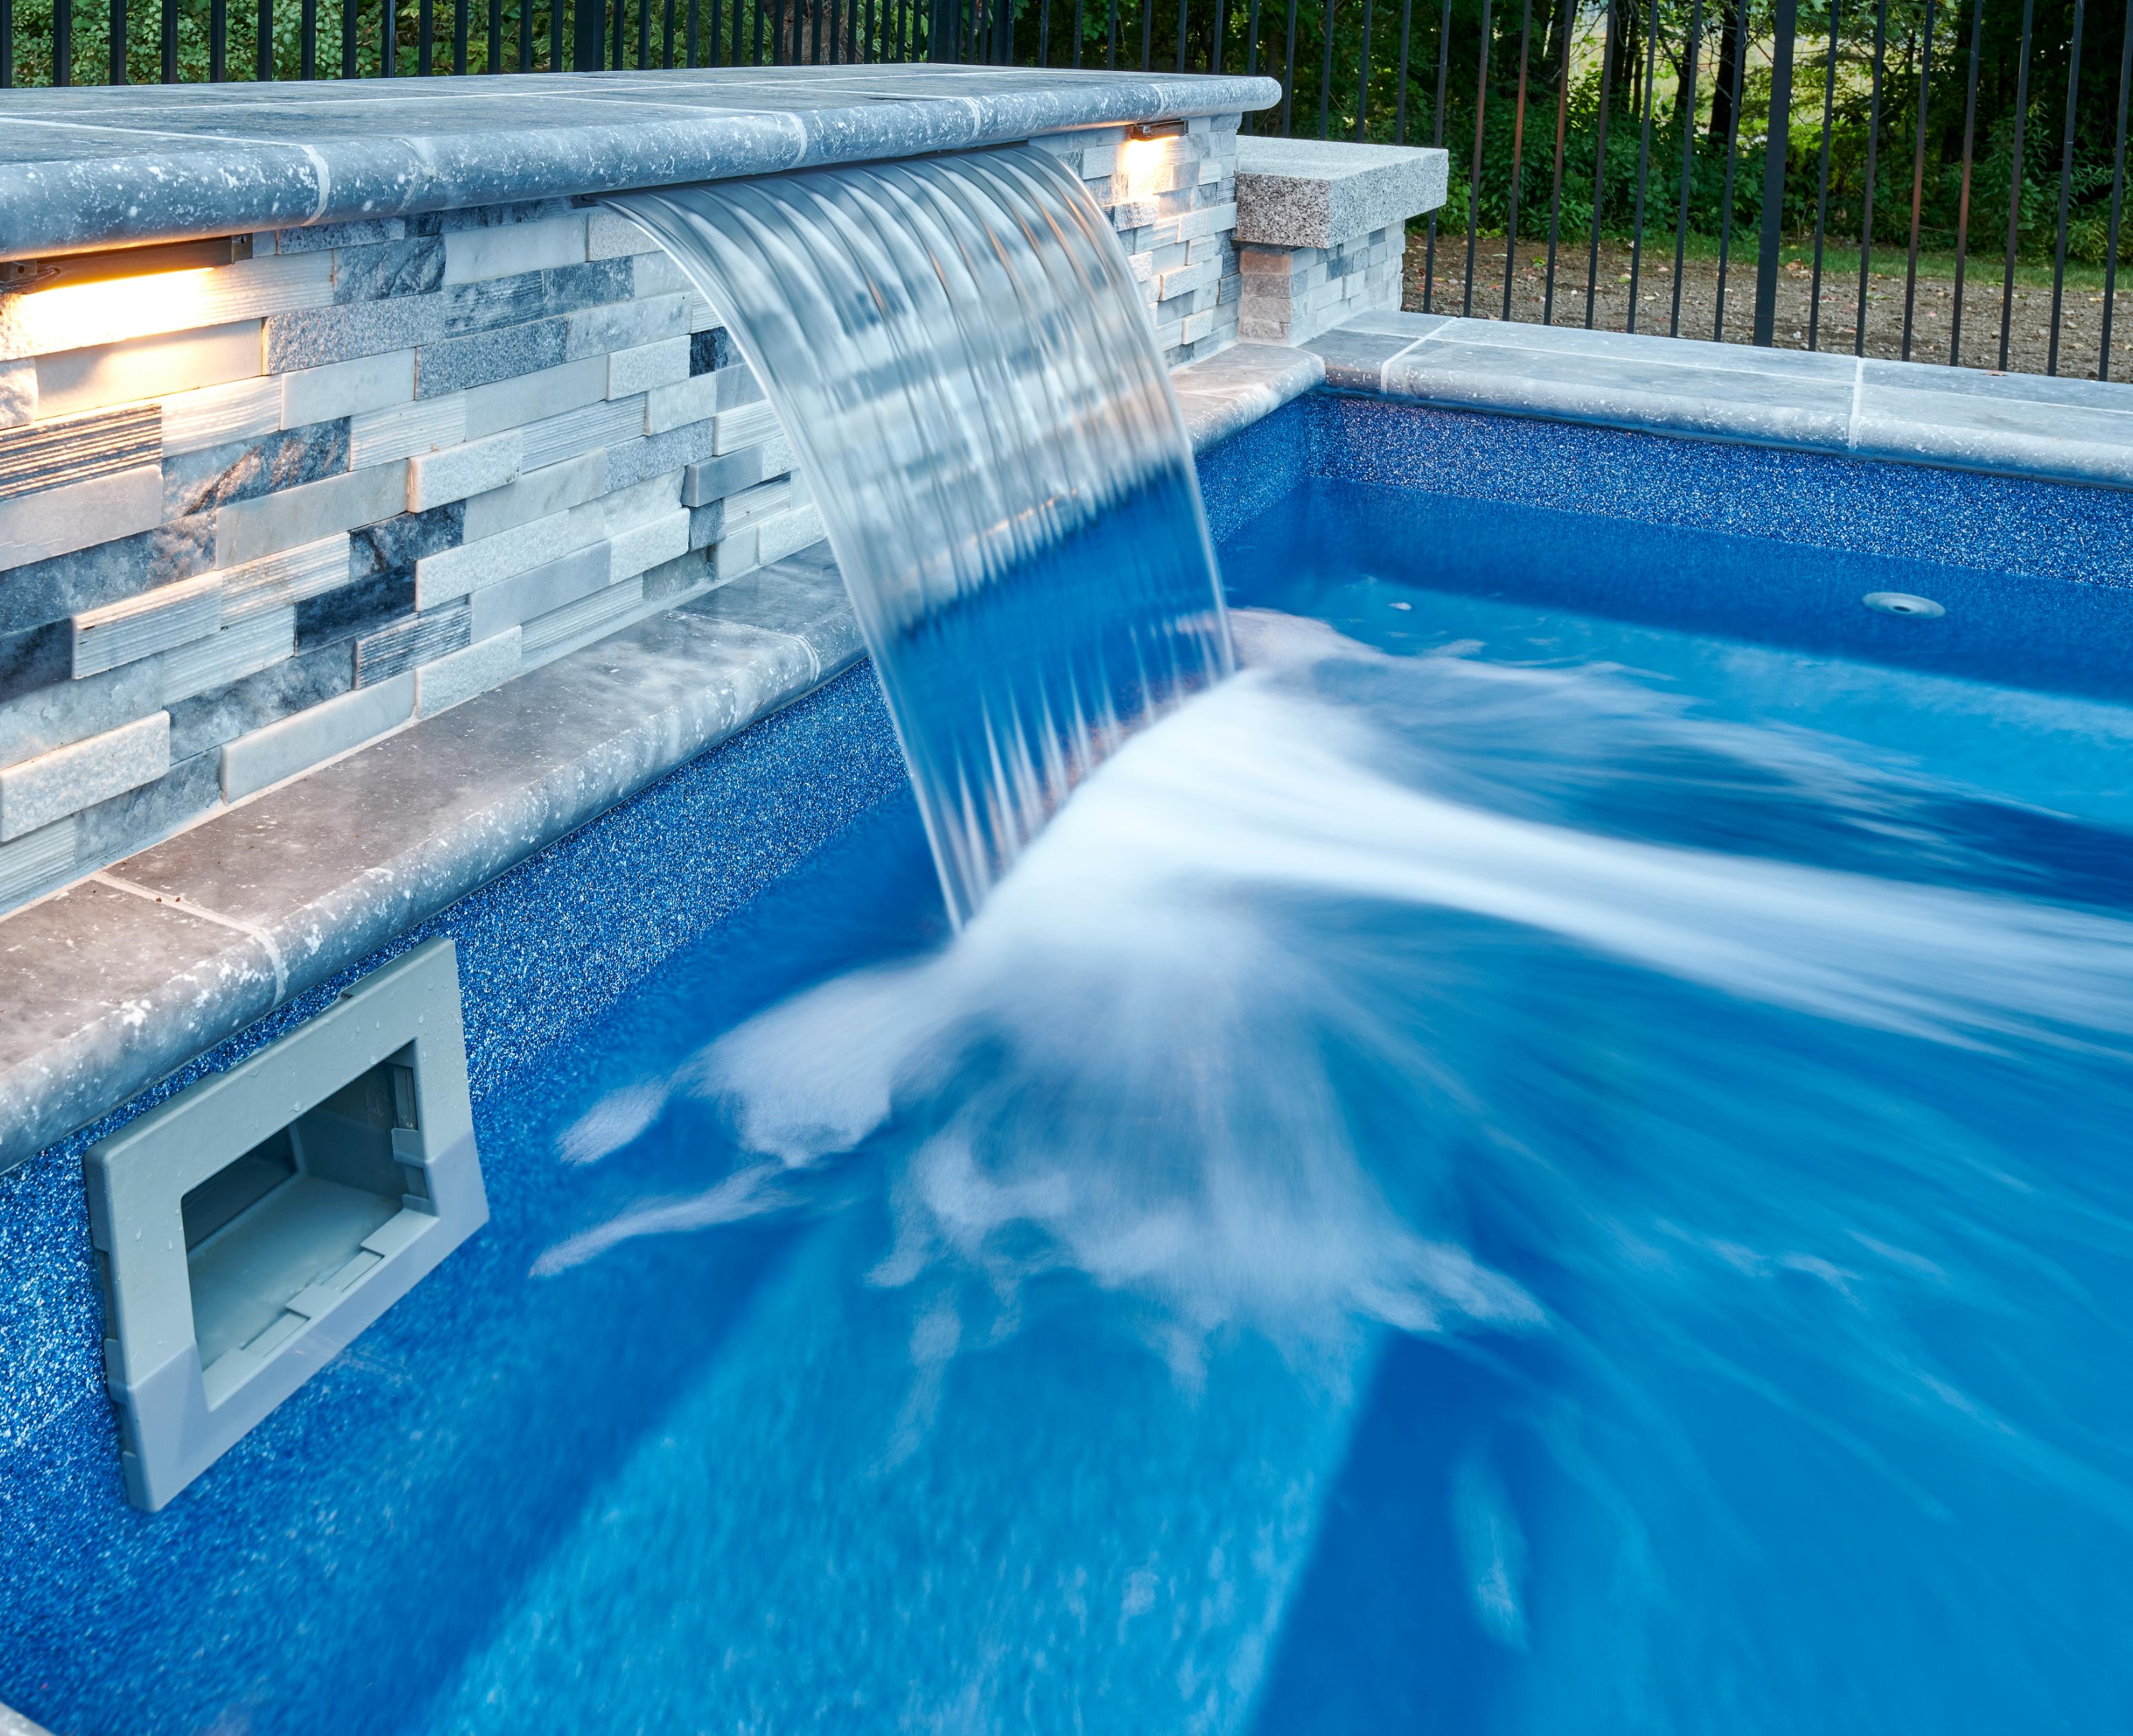 D&P Swimming Pools, Inc. Plaistow, New Hampshire